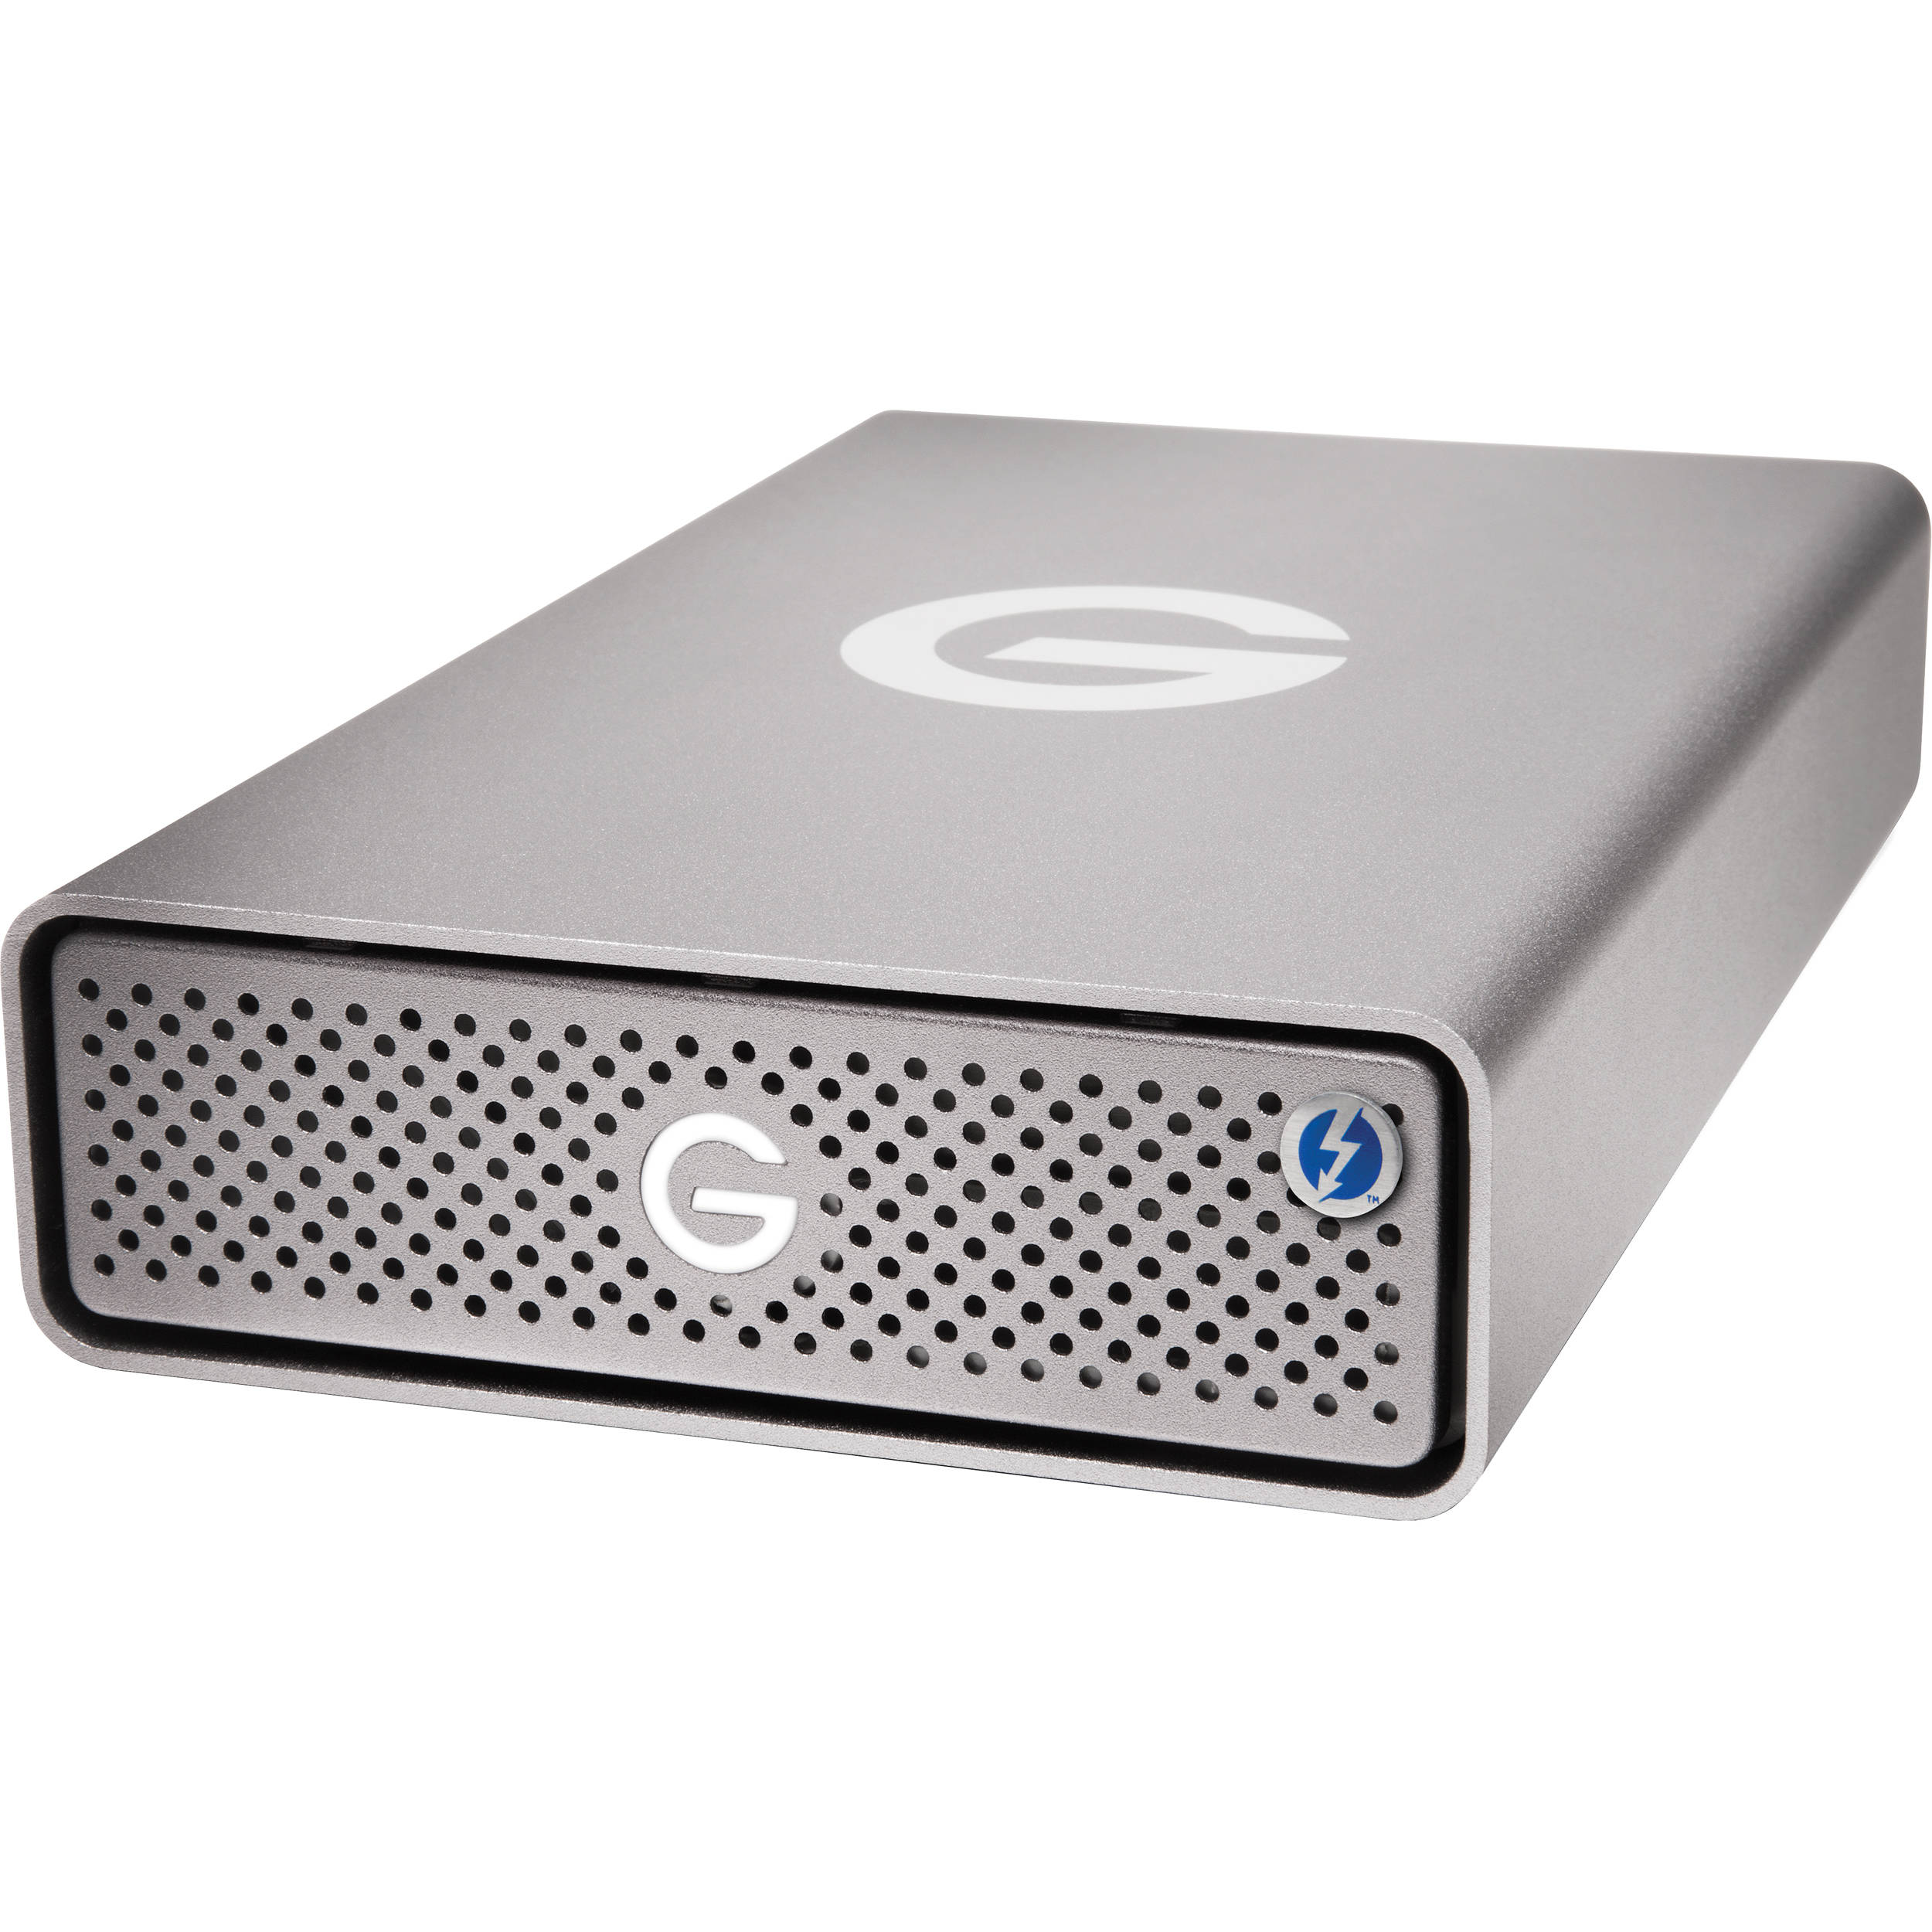 Https C Product 1408352 Reg Kotak Dvd Double 9mm Gt Pro G Technology 0g10275 960gb Drive Ssd 1408126